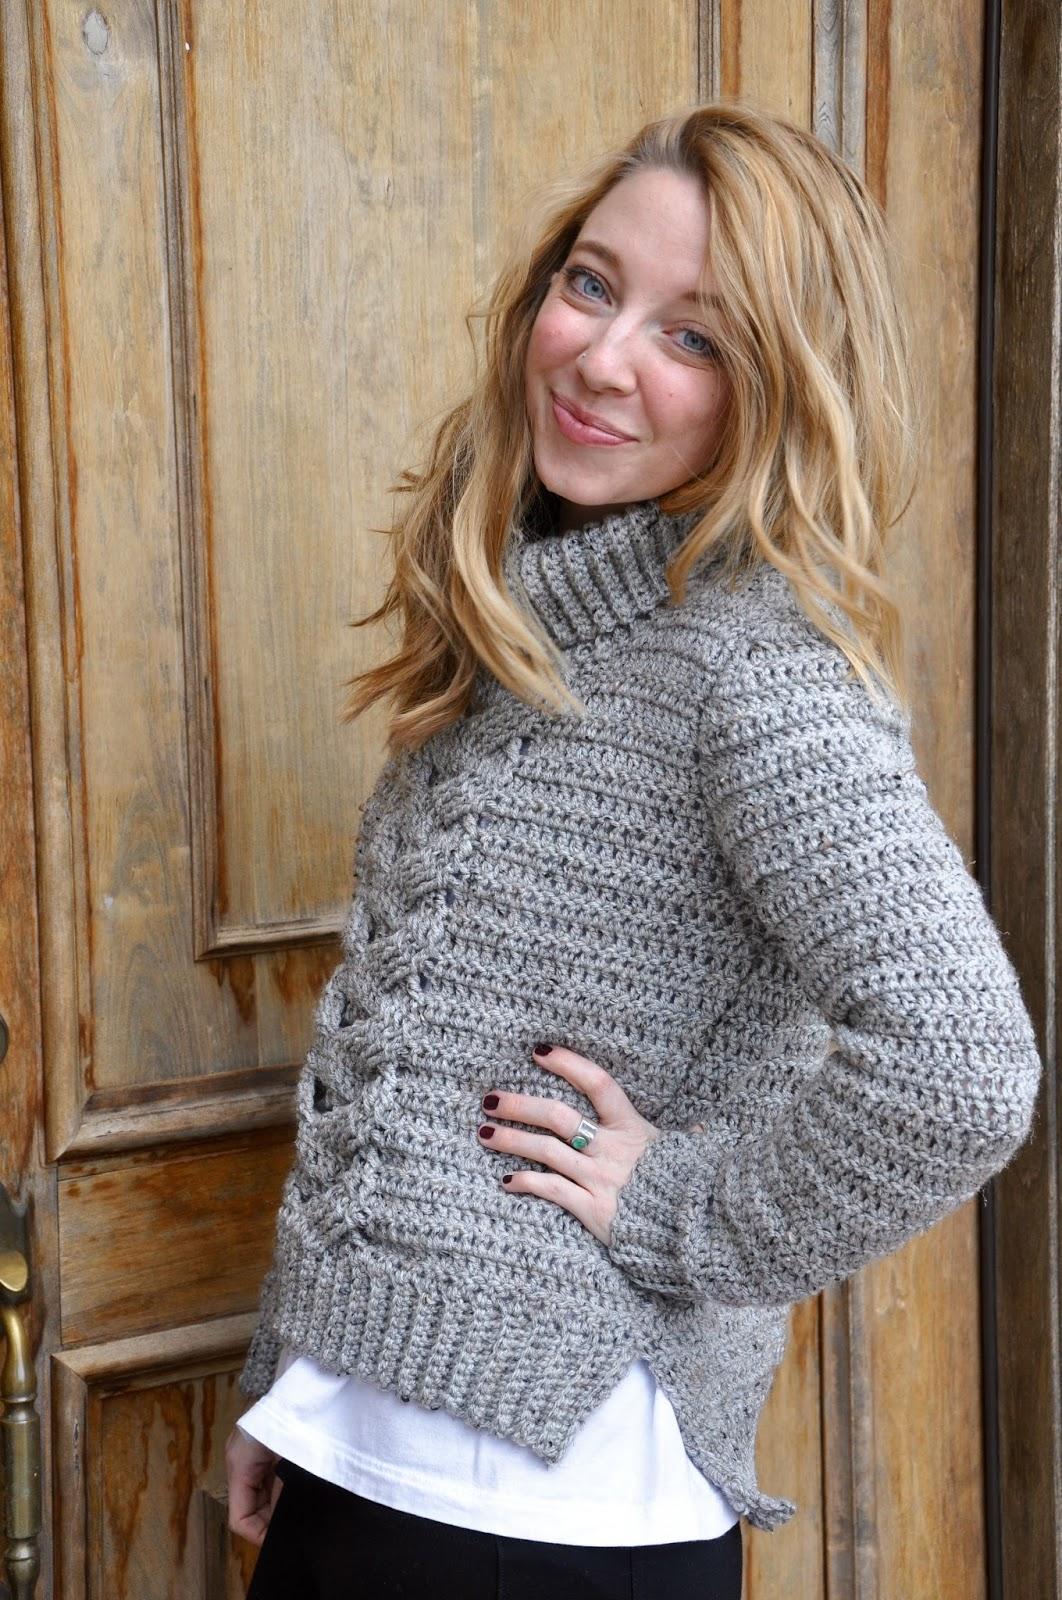 Sans Limites Crochet: Cable Turtleneck Sweater! Finally! A New ...